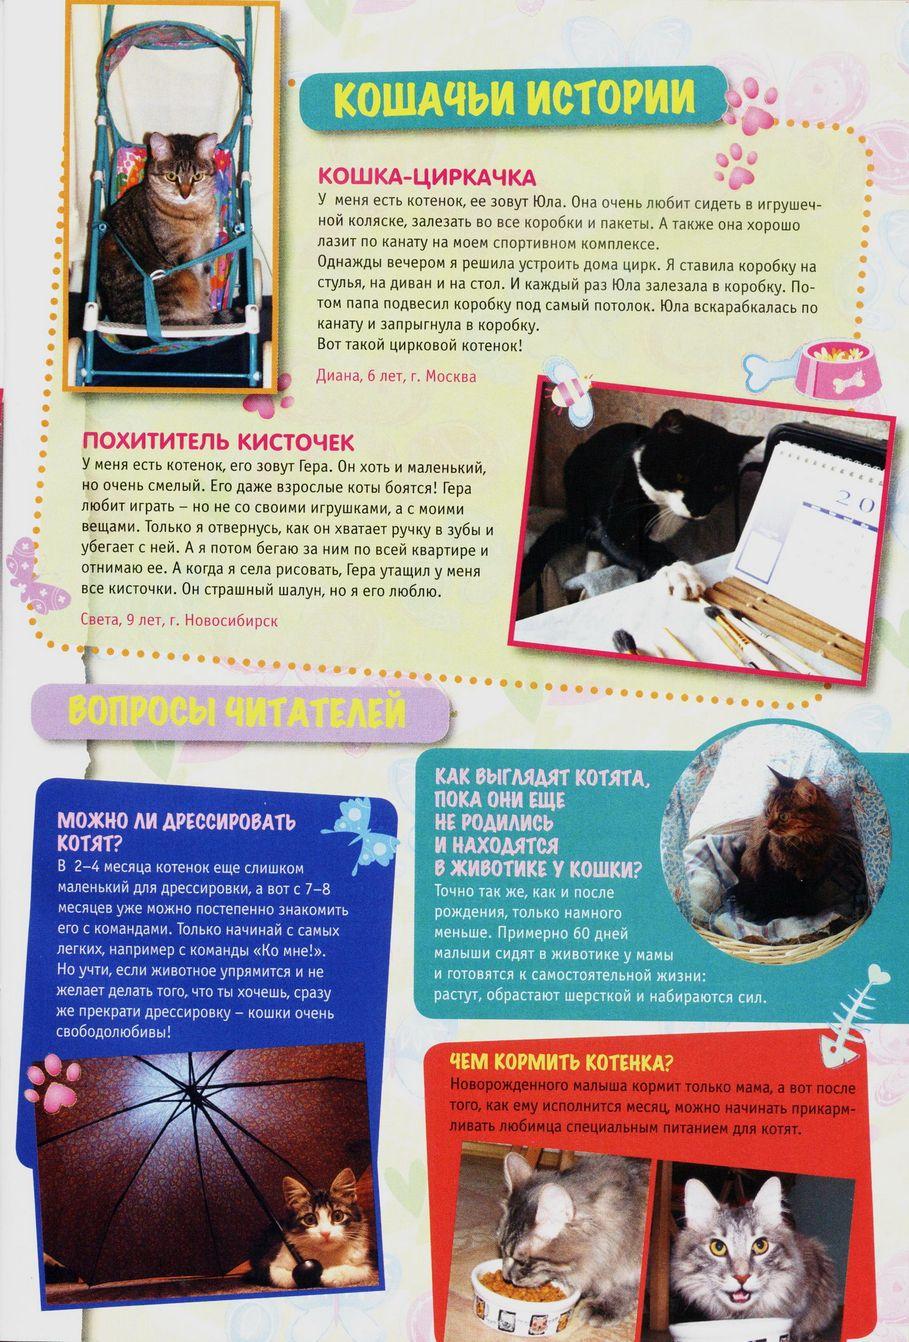 Комикс Винкс Winx - Волшебник Камуд (Журнал Винкс №6 2011) - стр. 13